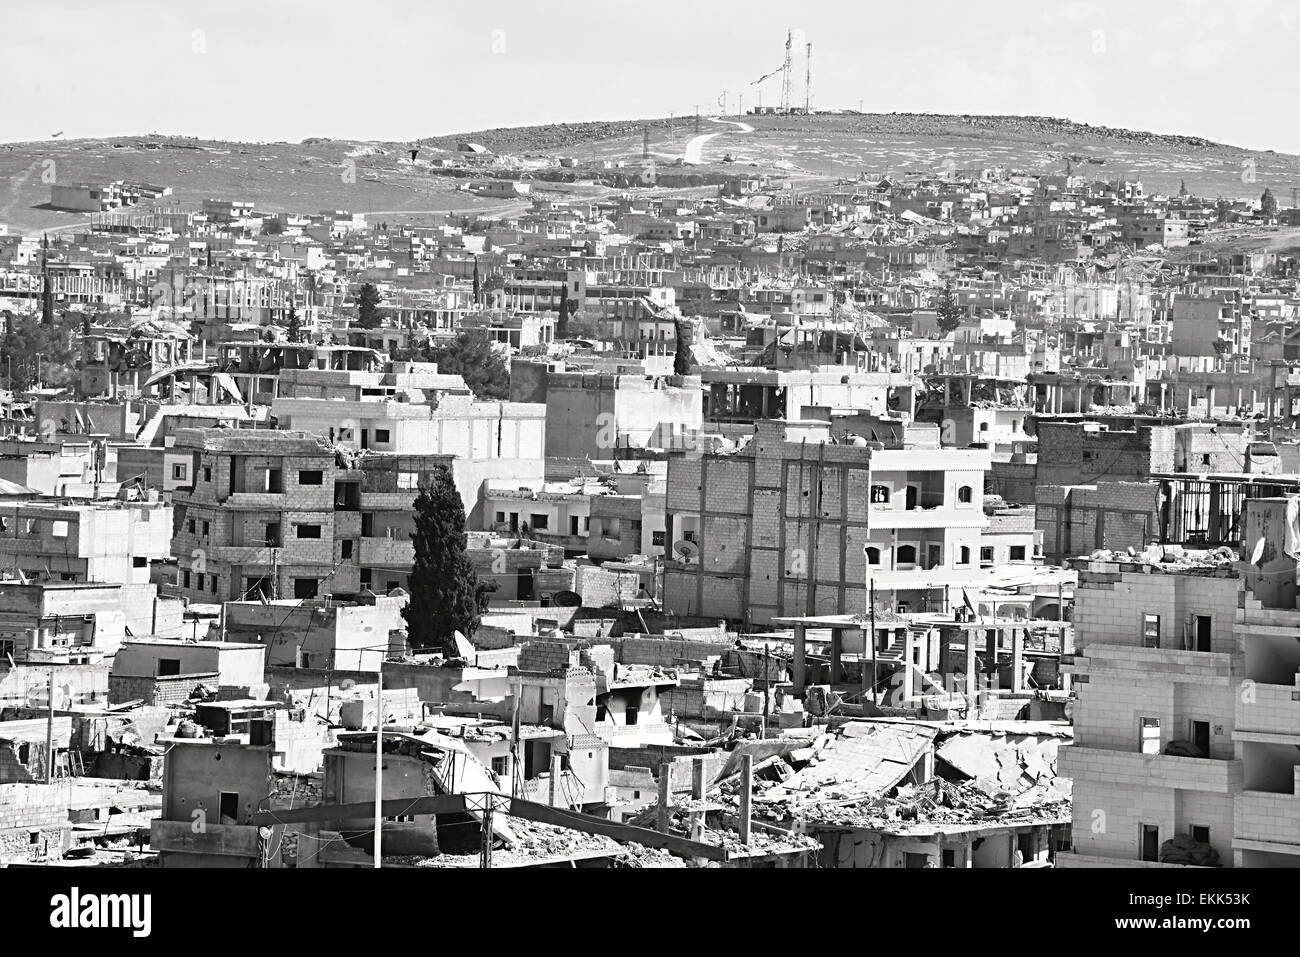 Destruction of Kobane - kurdish city in northern Syria. 31.3.2015, Kobane, Syria - Stock Image